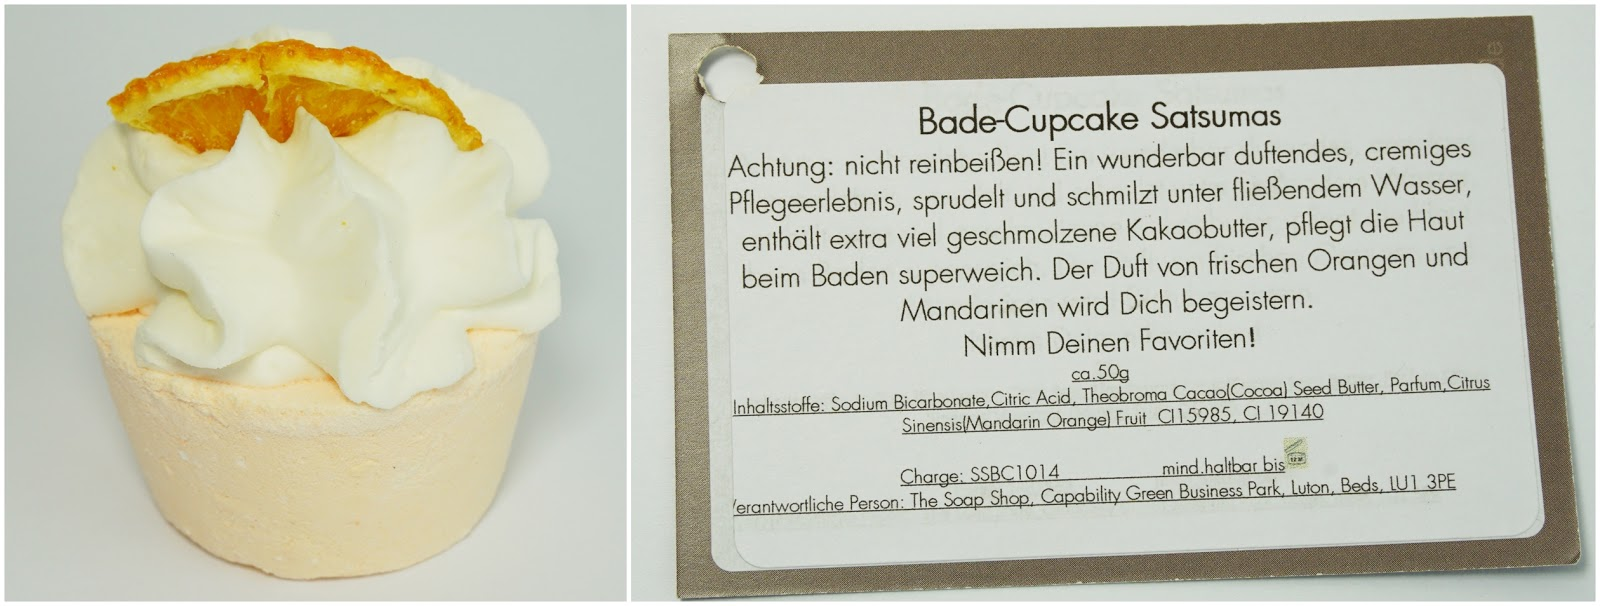 Badegeister - Bade-Cupcake Satsumas